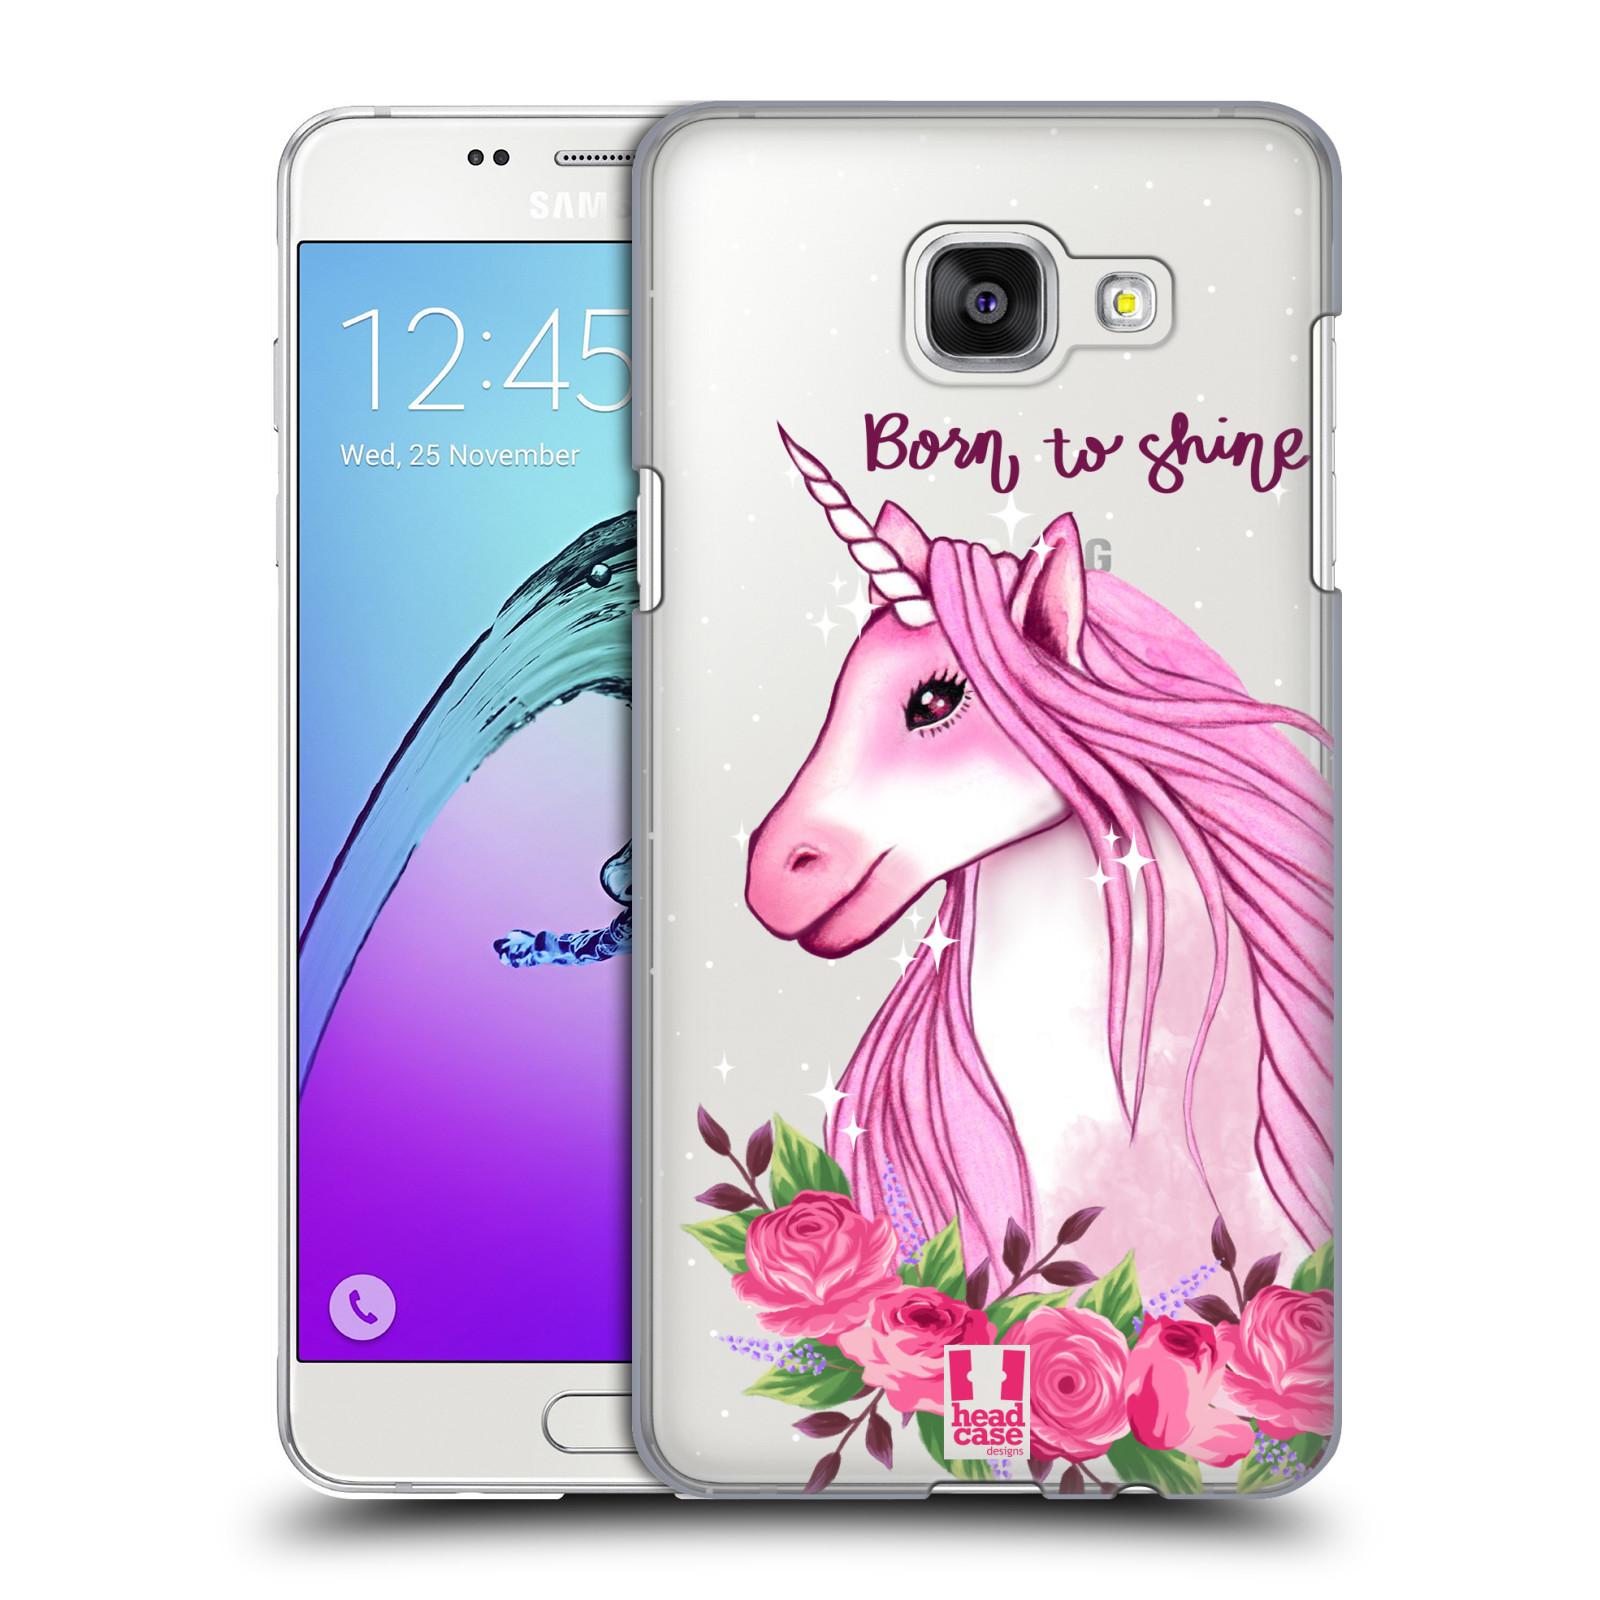 Plastové pouzdro na mobil Samsung Galaxy A5 (2016) - Head Case - Jednorožec - Born to shine